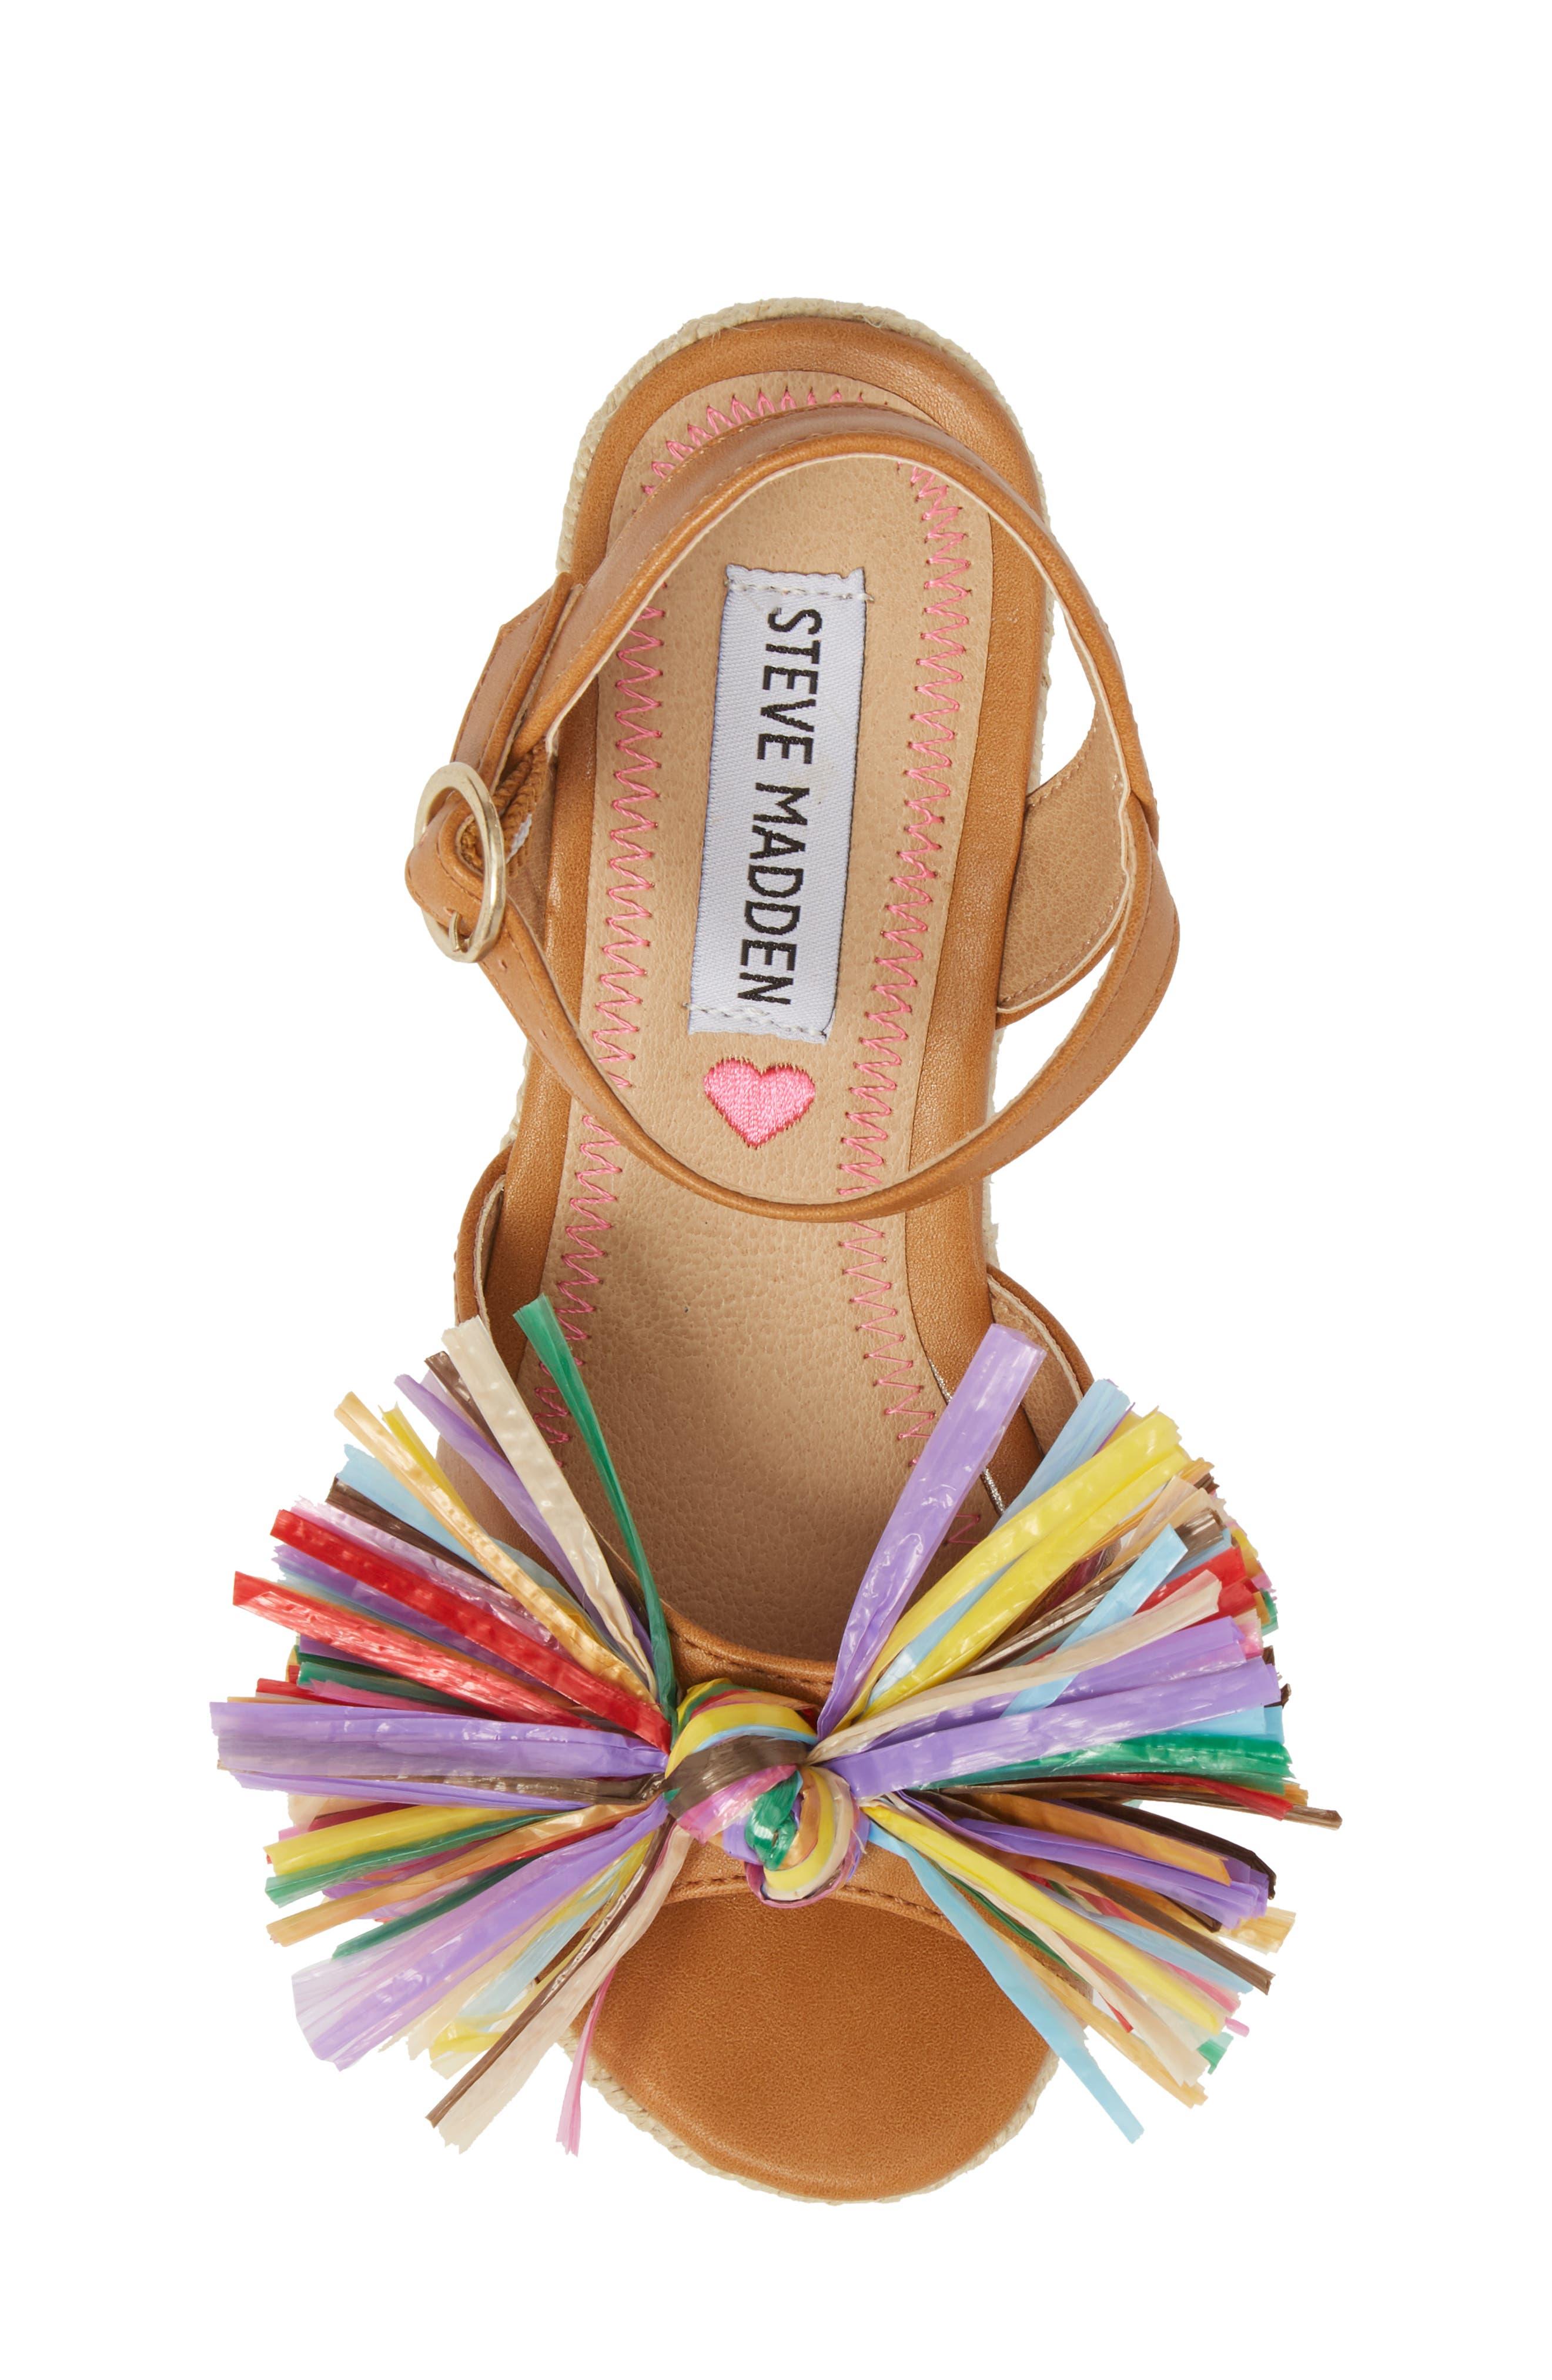 JSTRWBERI Wedge Sandal,                             Alternate thumbnail 5, color,                             Cognac Multi